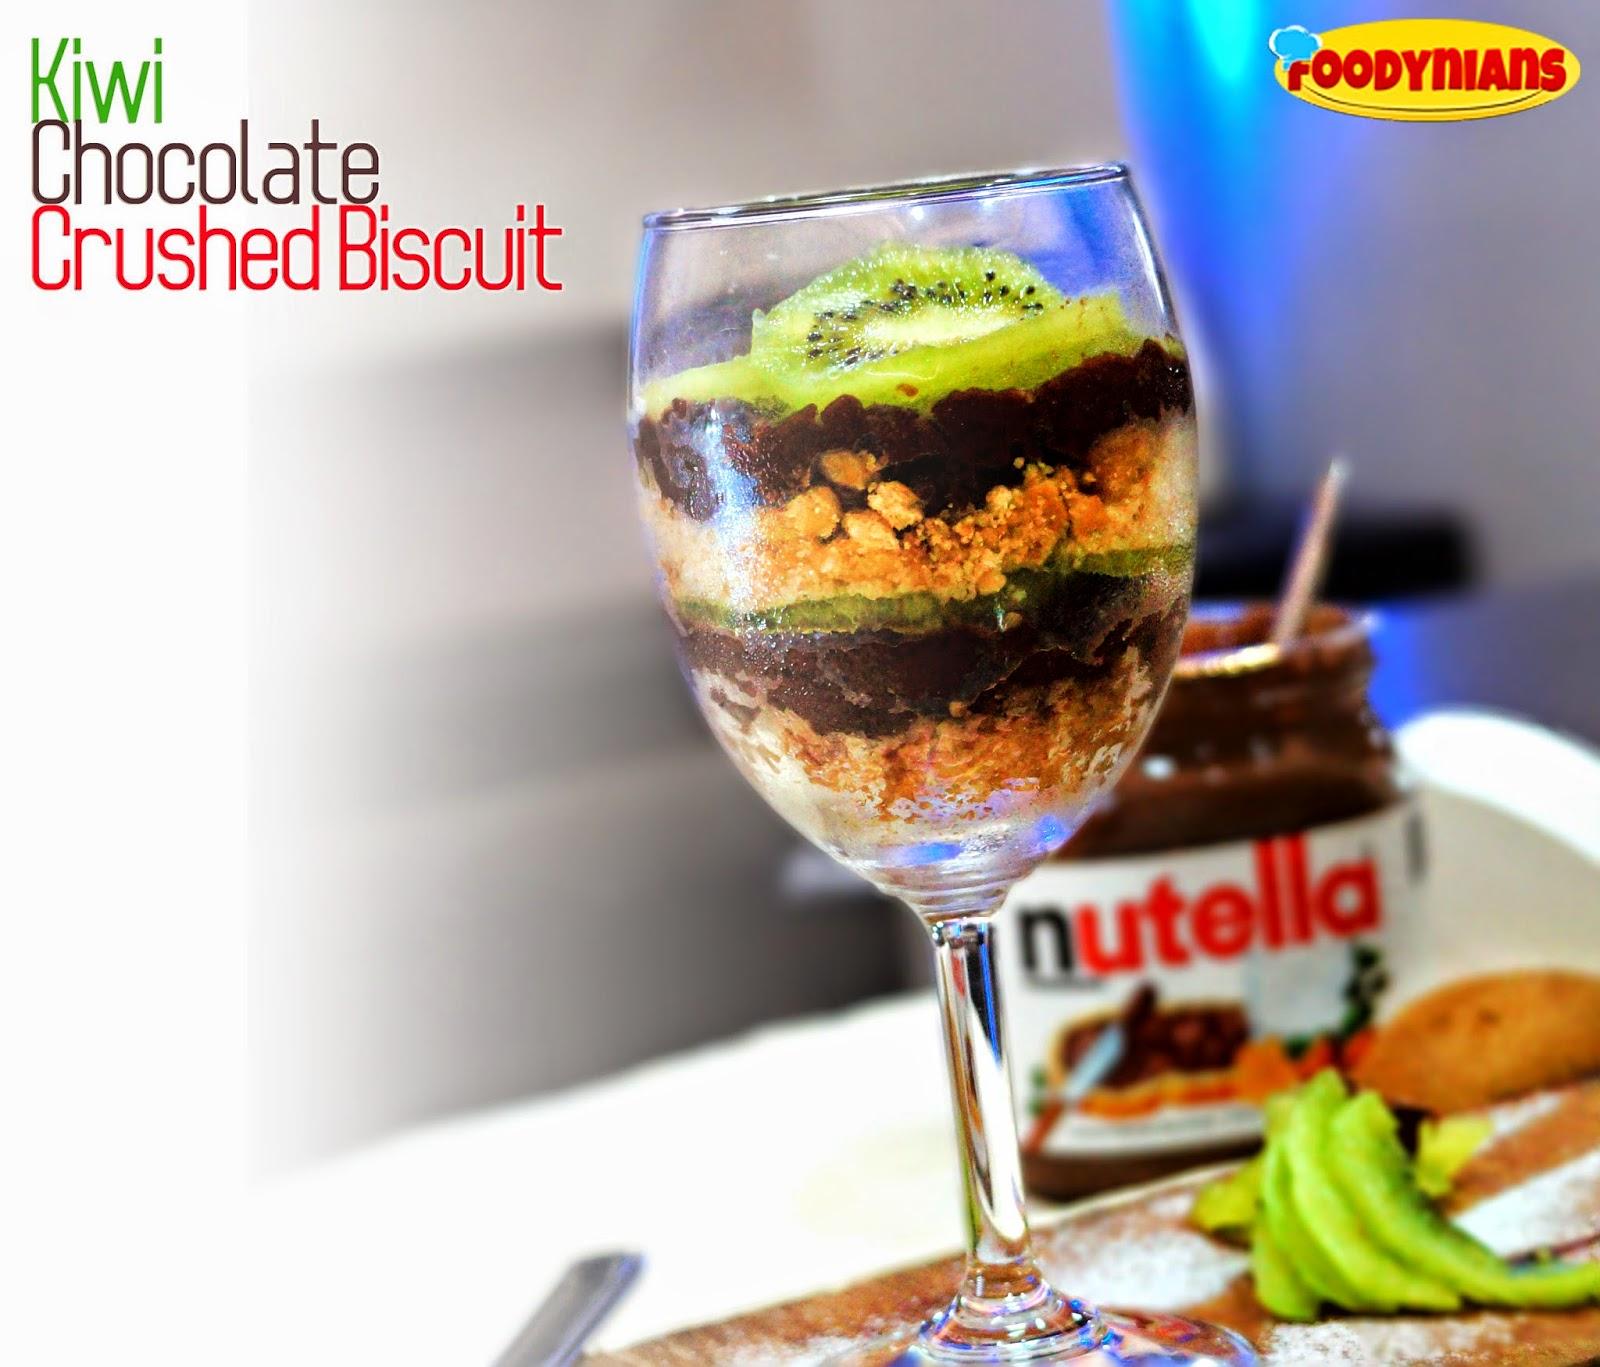 Kiwi-chocolate-crushed-biscuit